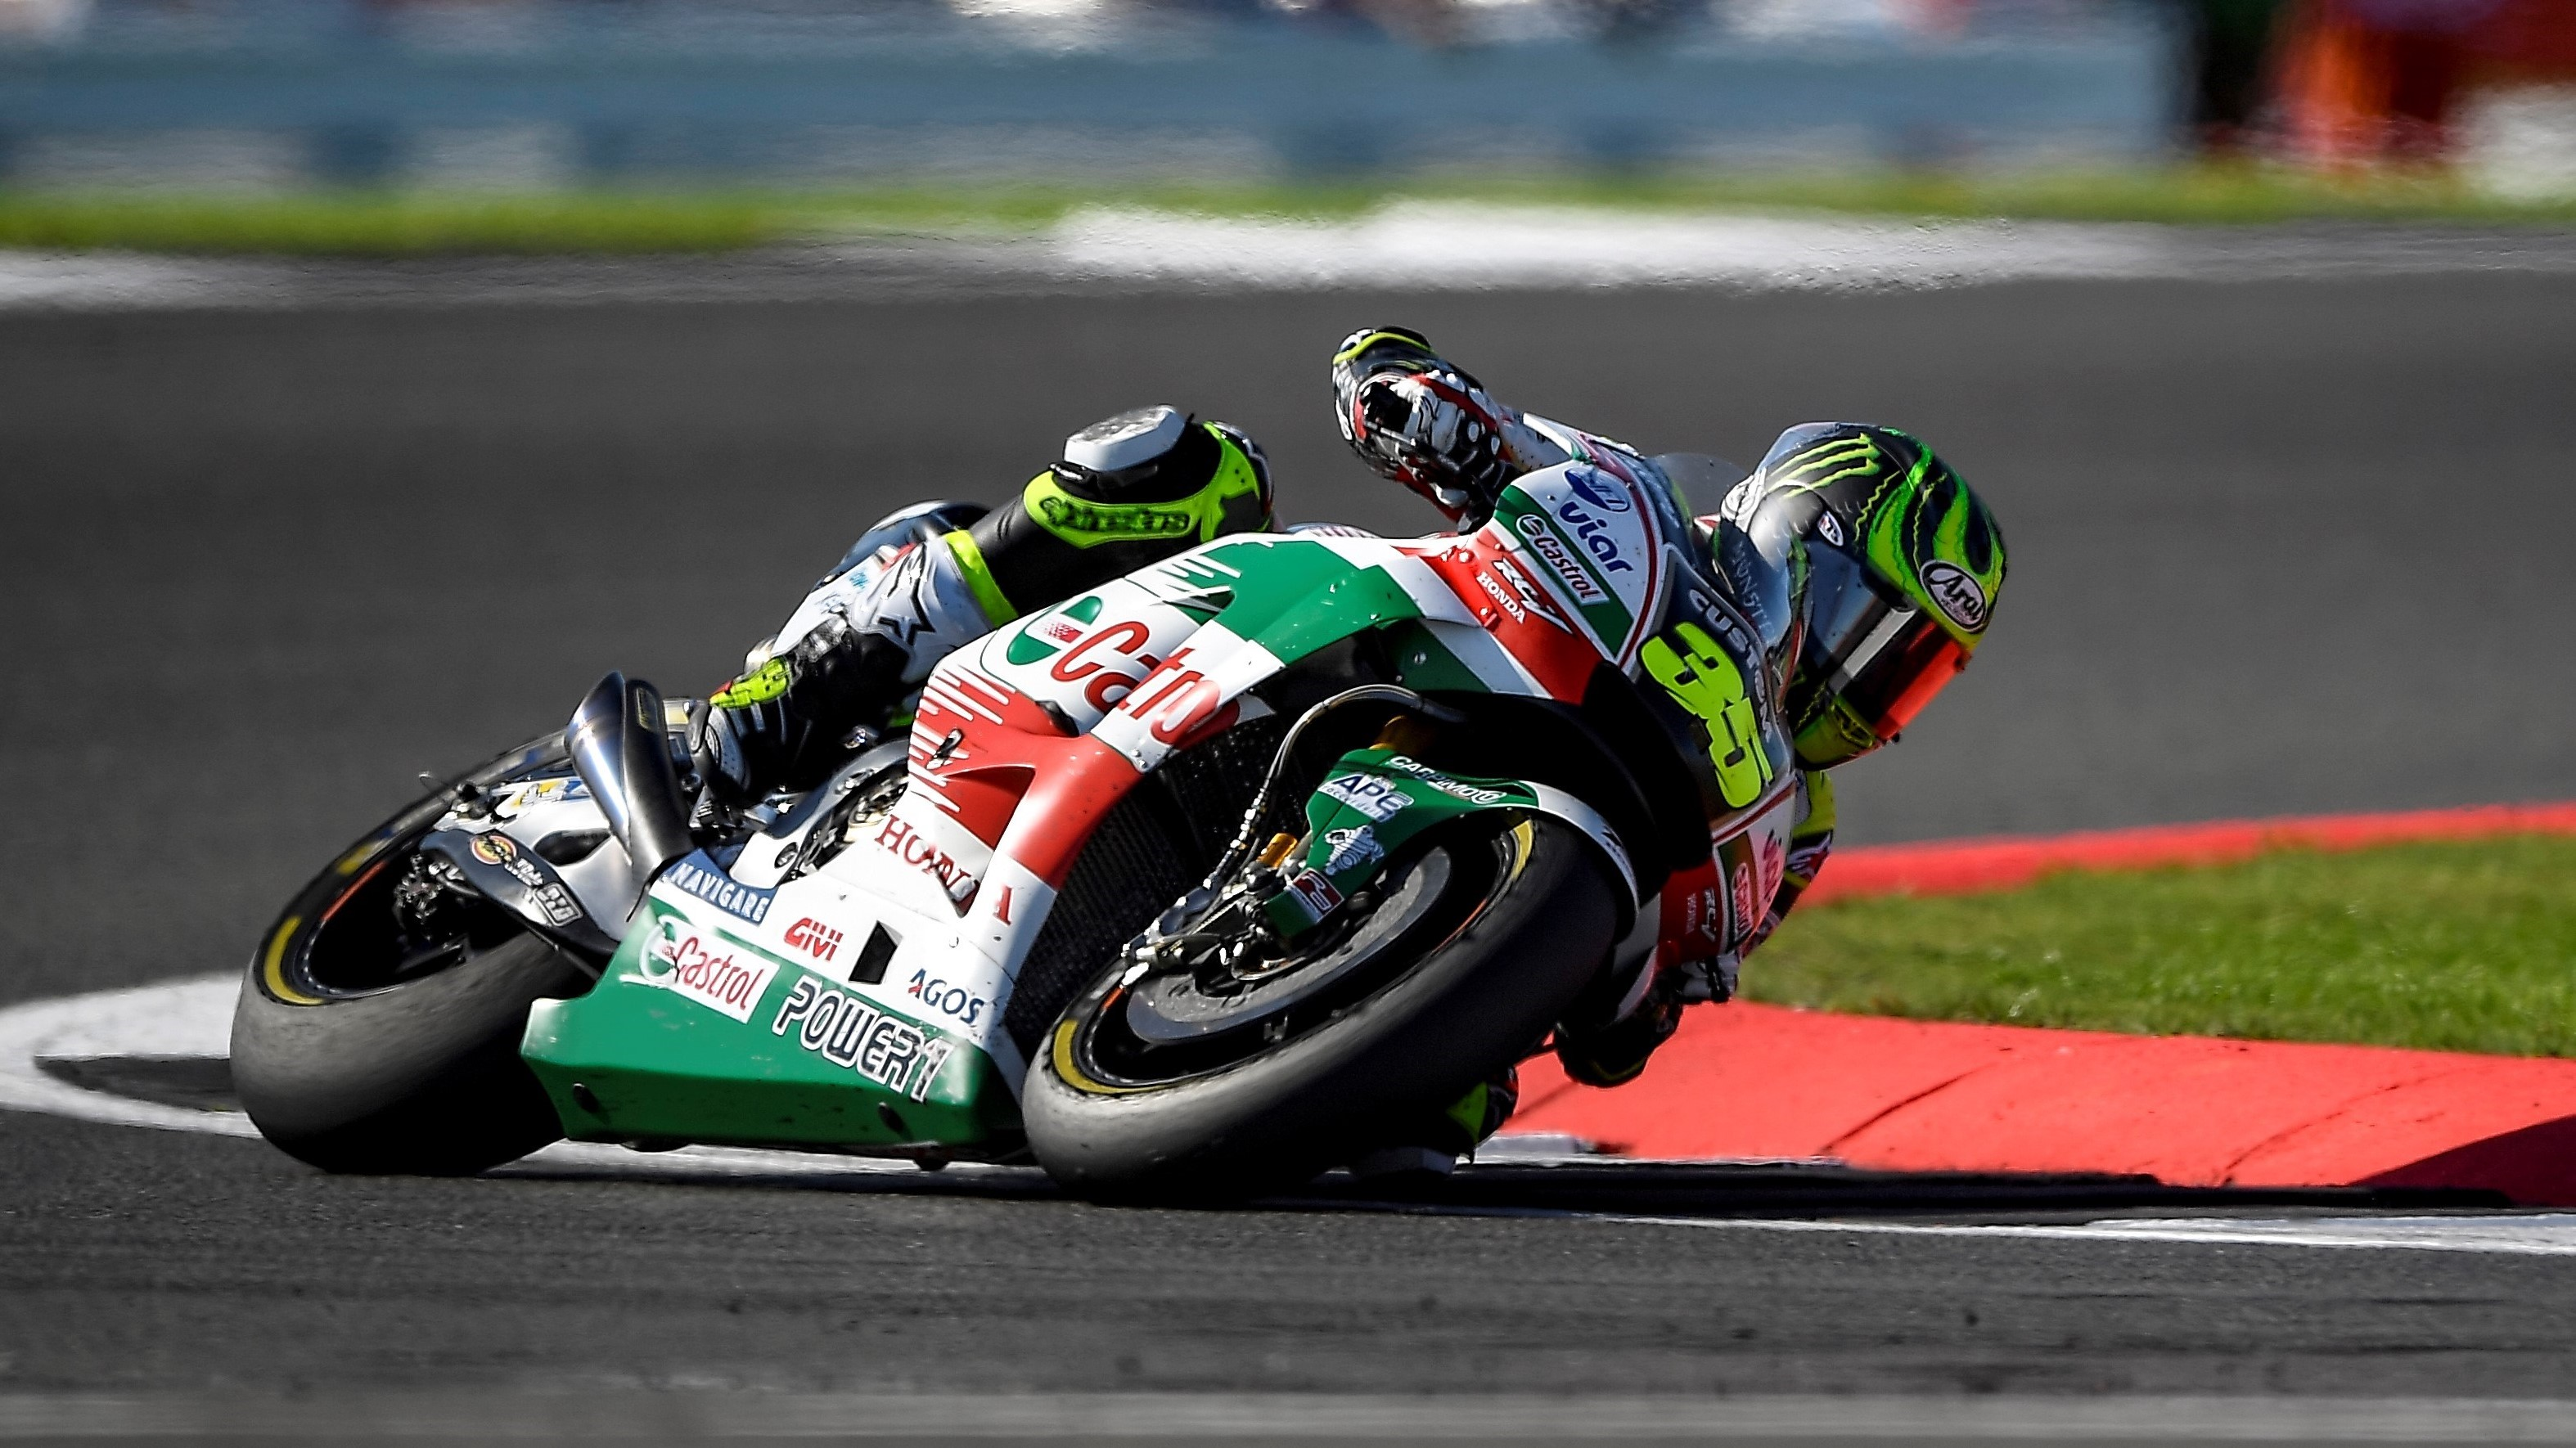 MotoGP 2017 Round Twelve: Silverstone, UK